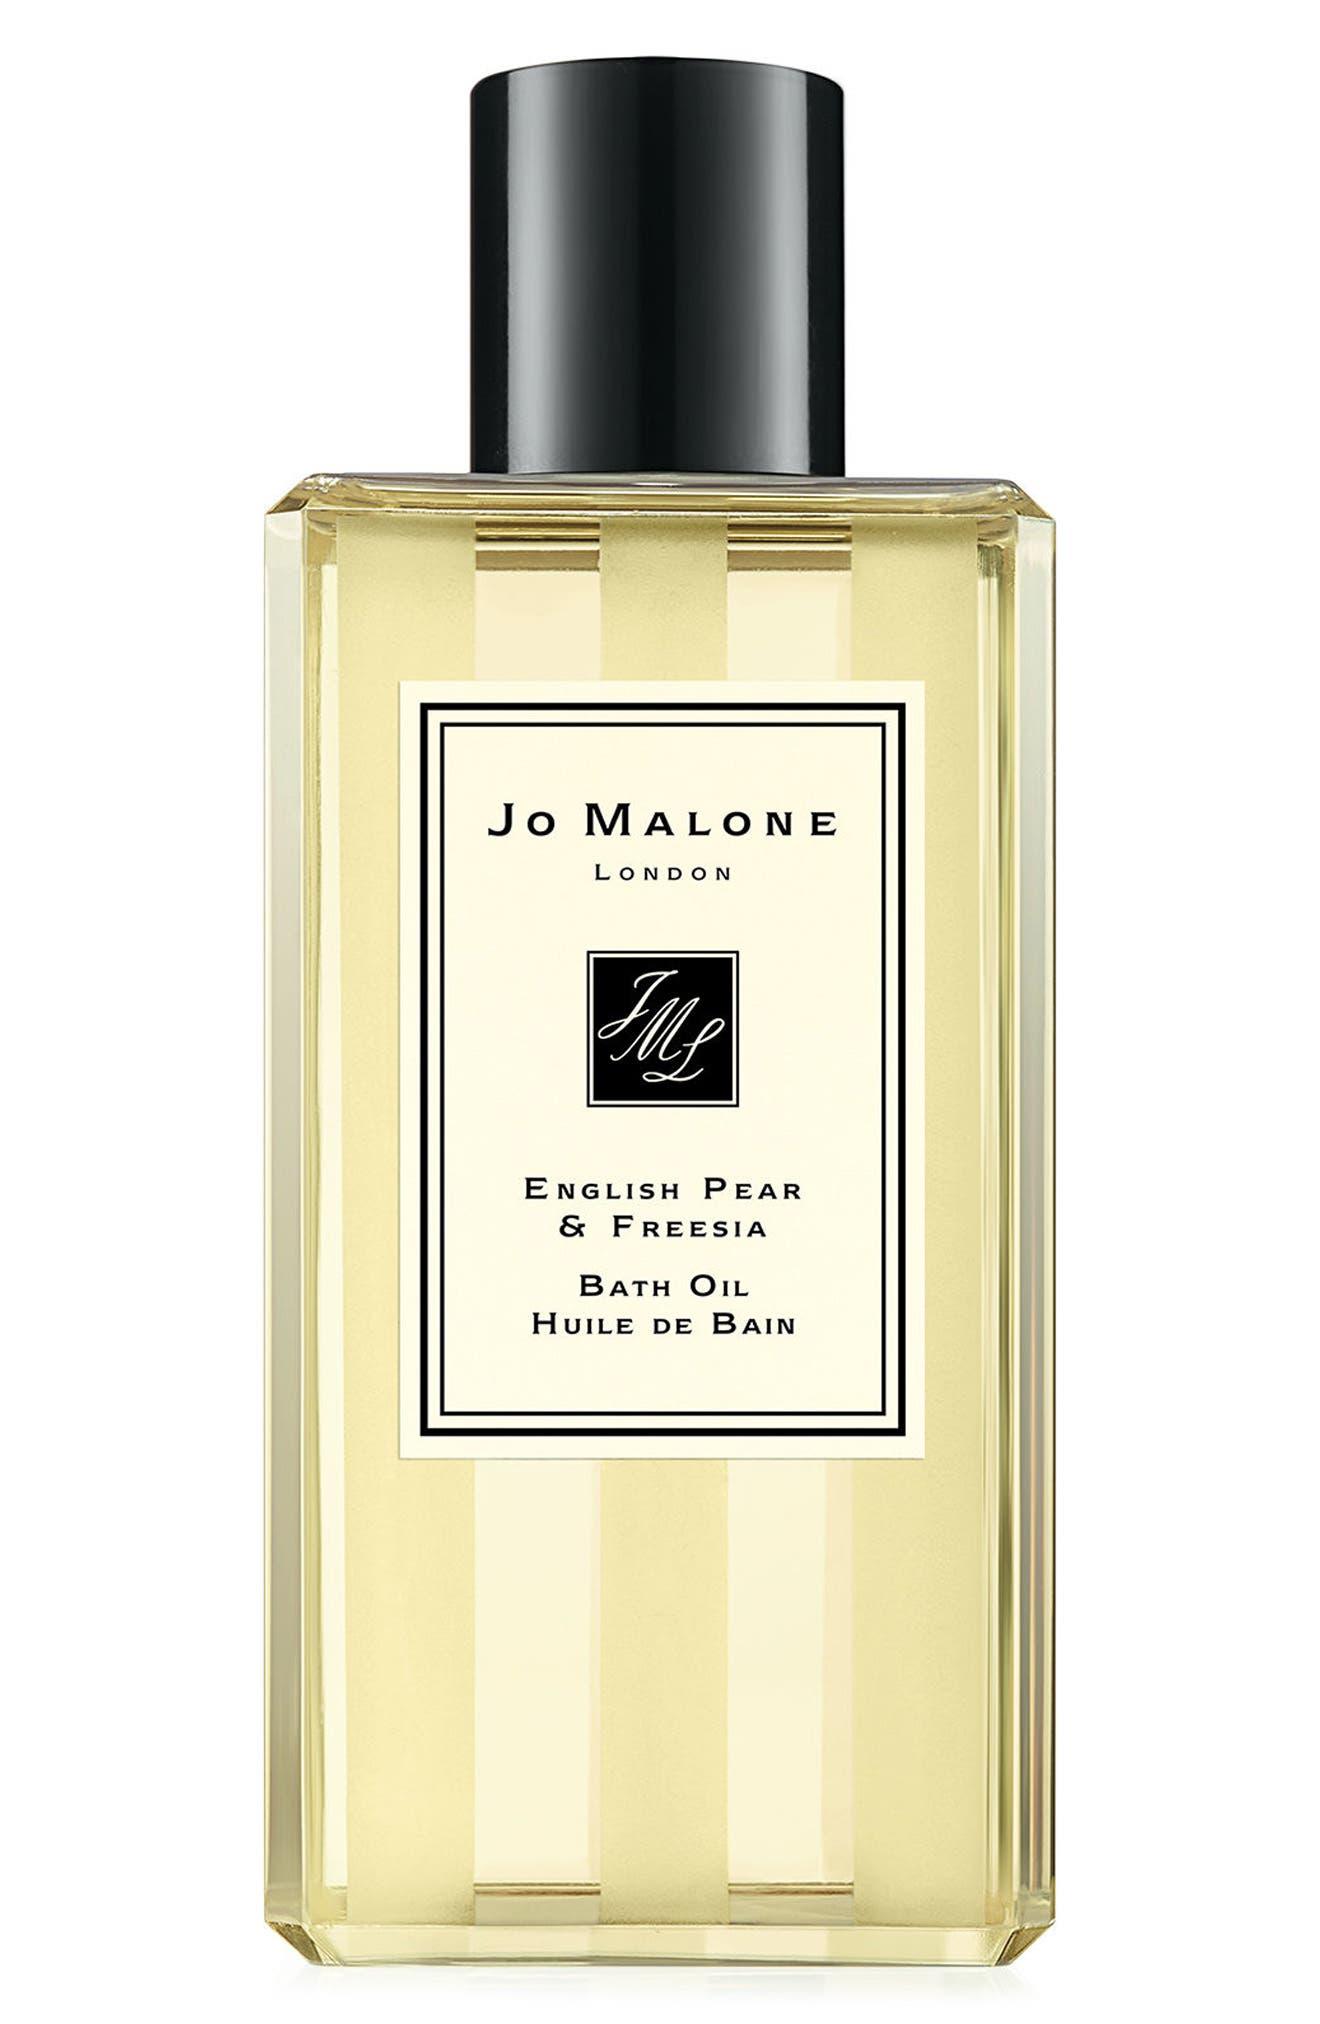 Jo Malone London(TM) English Pear & Freesia Bath Oil